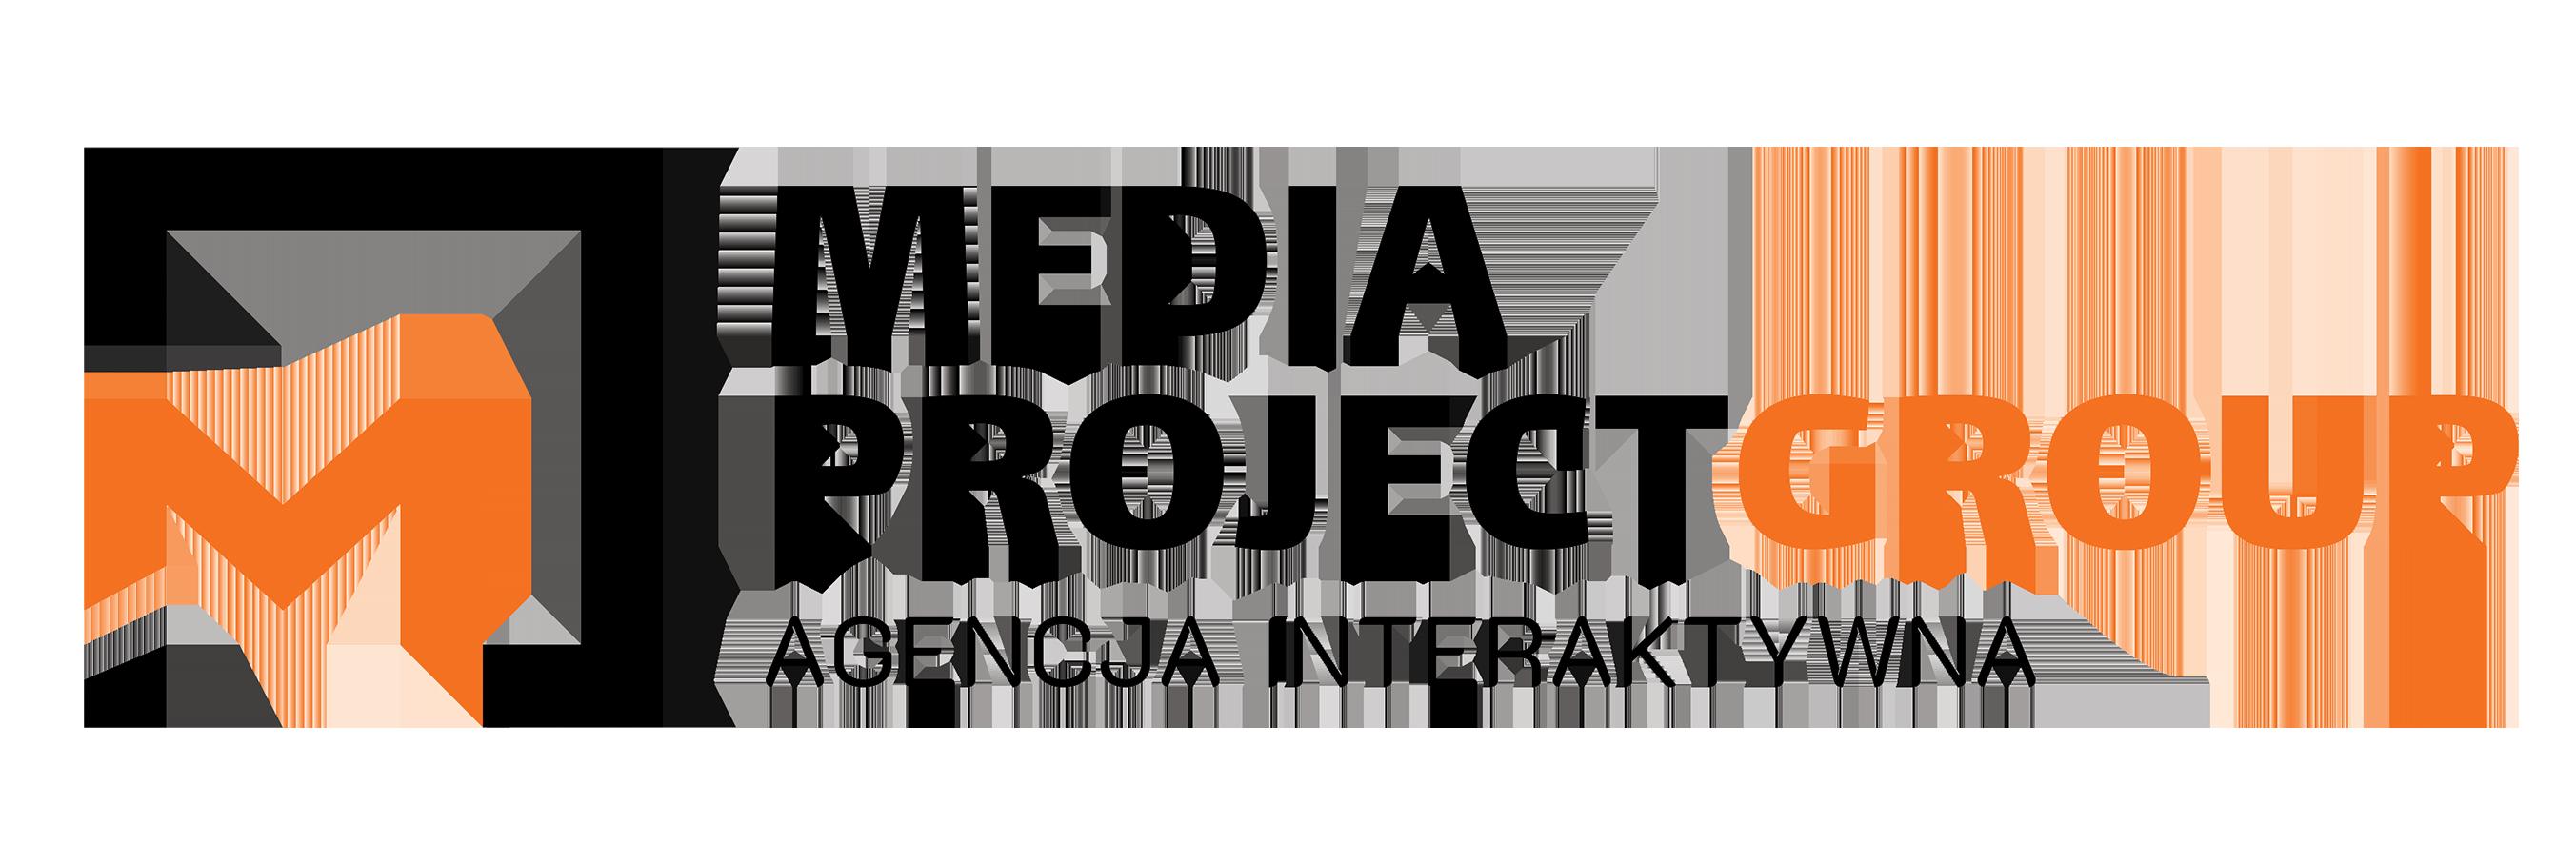 Agencja interaktywna Media Project Group